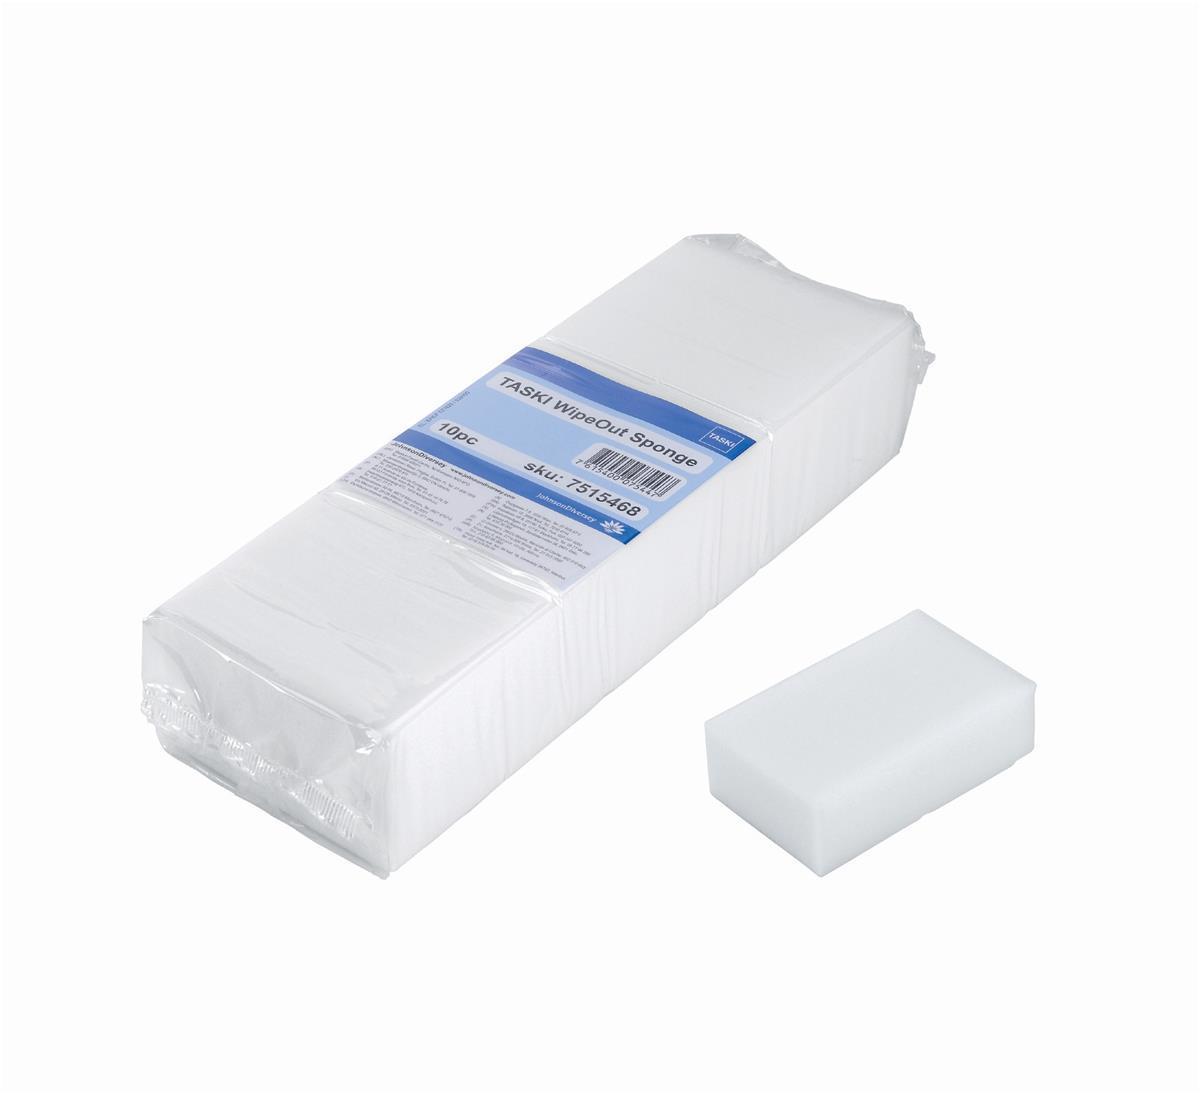 TASKI Wipe Out Sponge Pack 10 Code 7515468